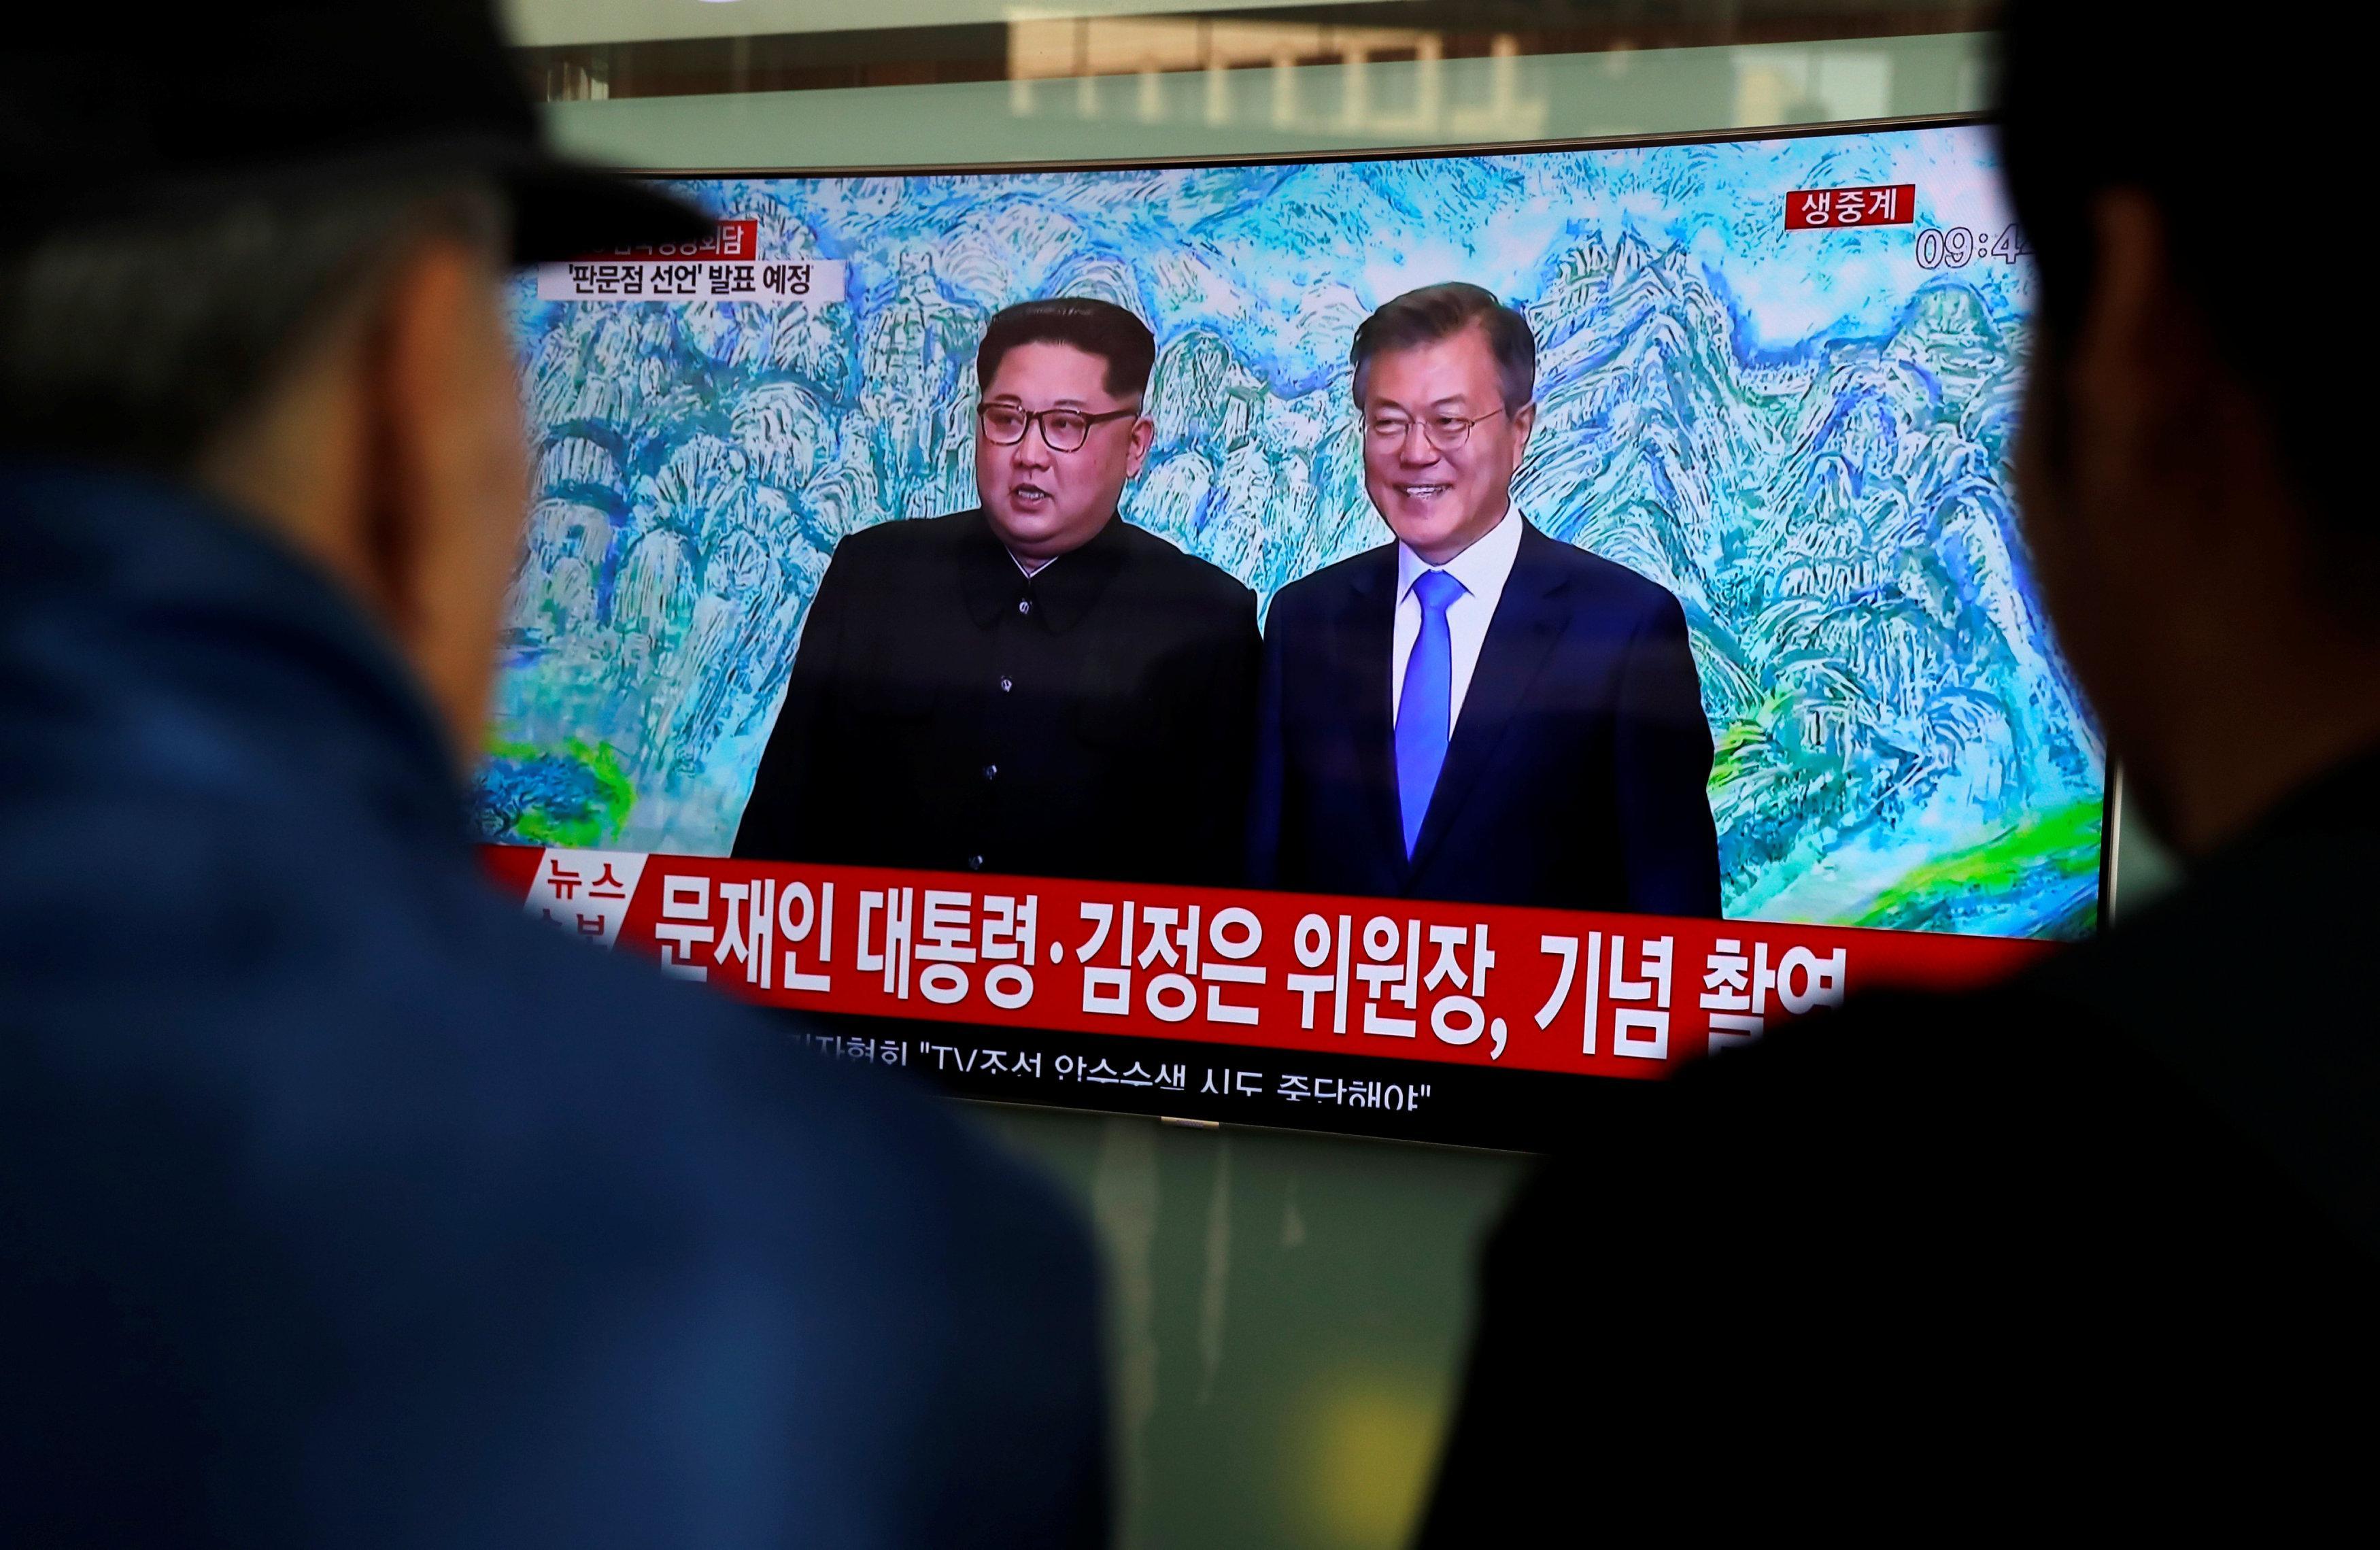 U.S. hopeful Korea talks will achieve progress toward peace